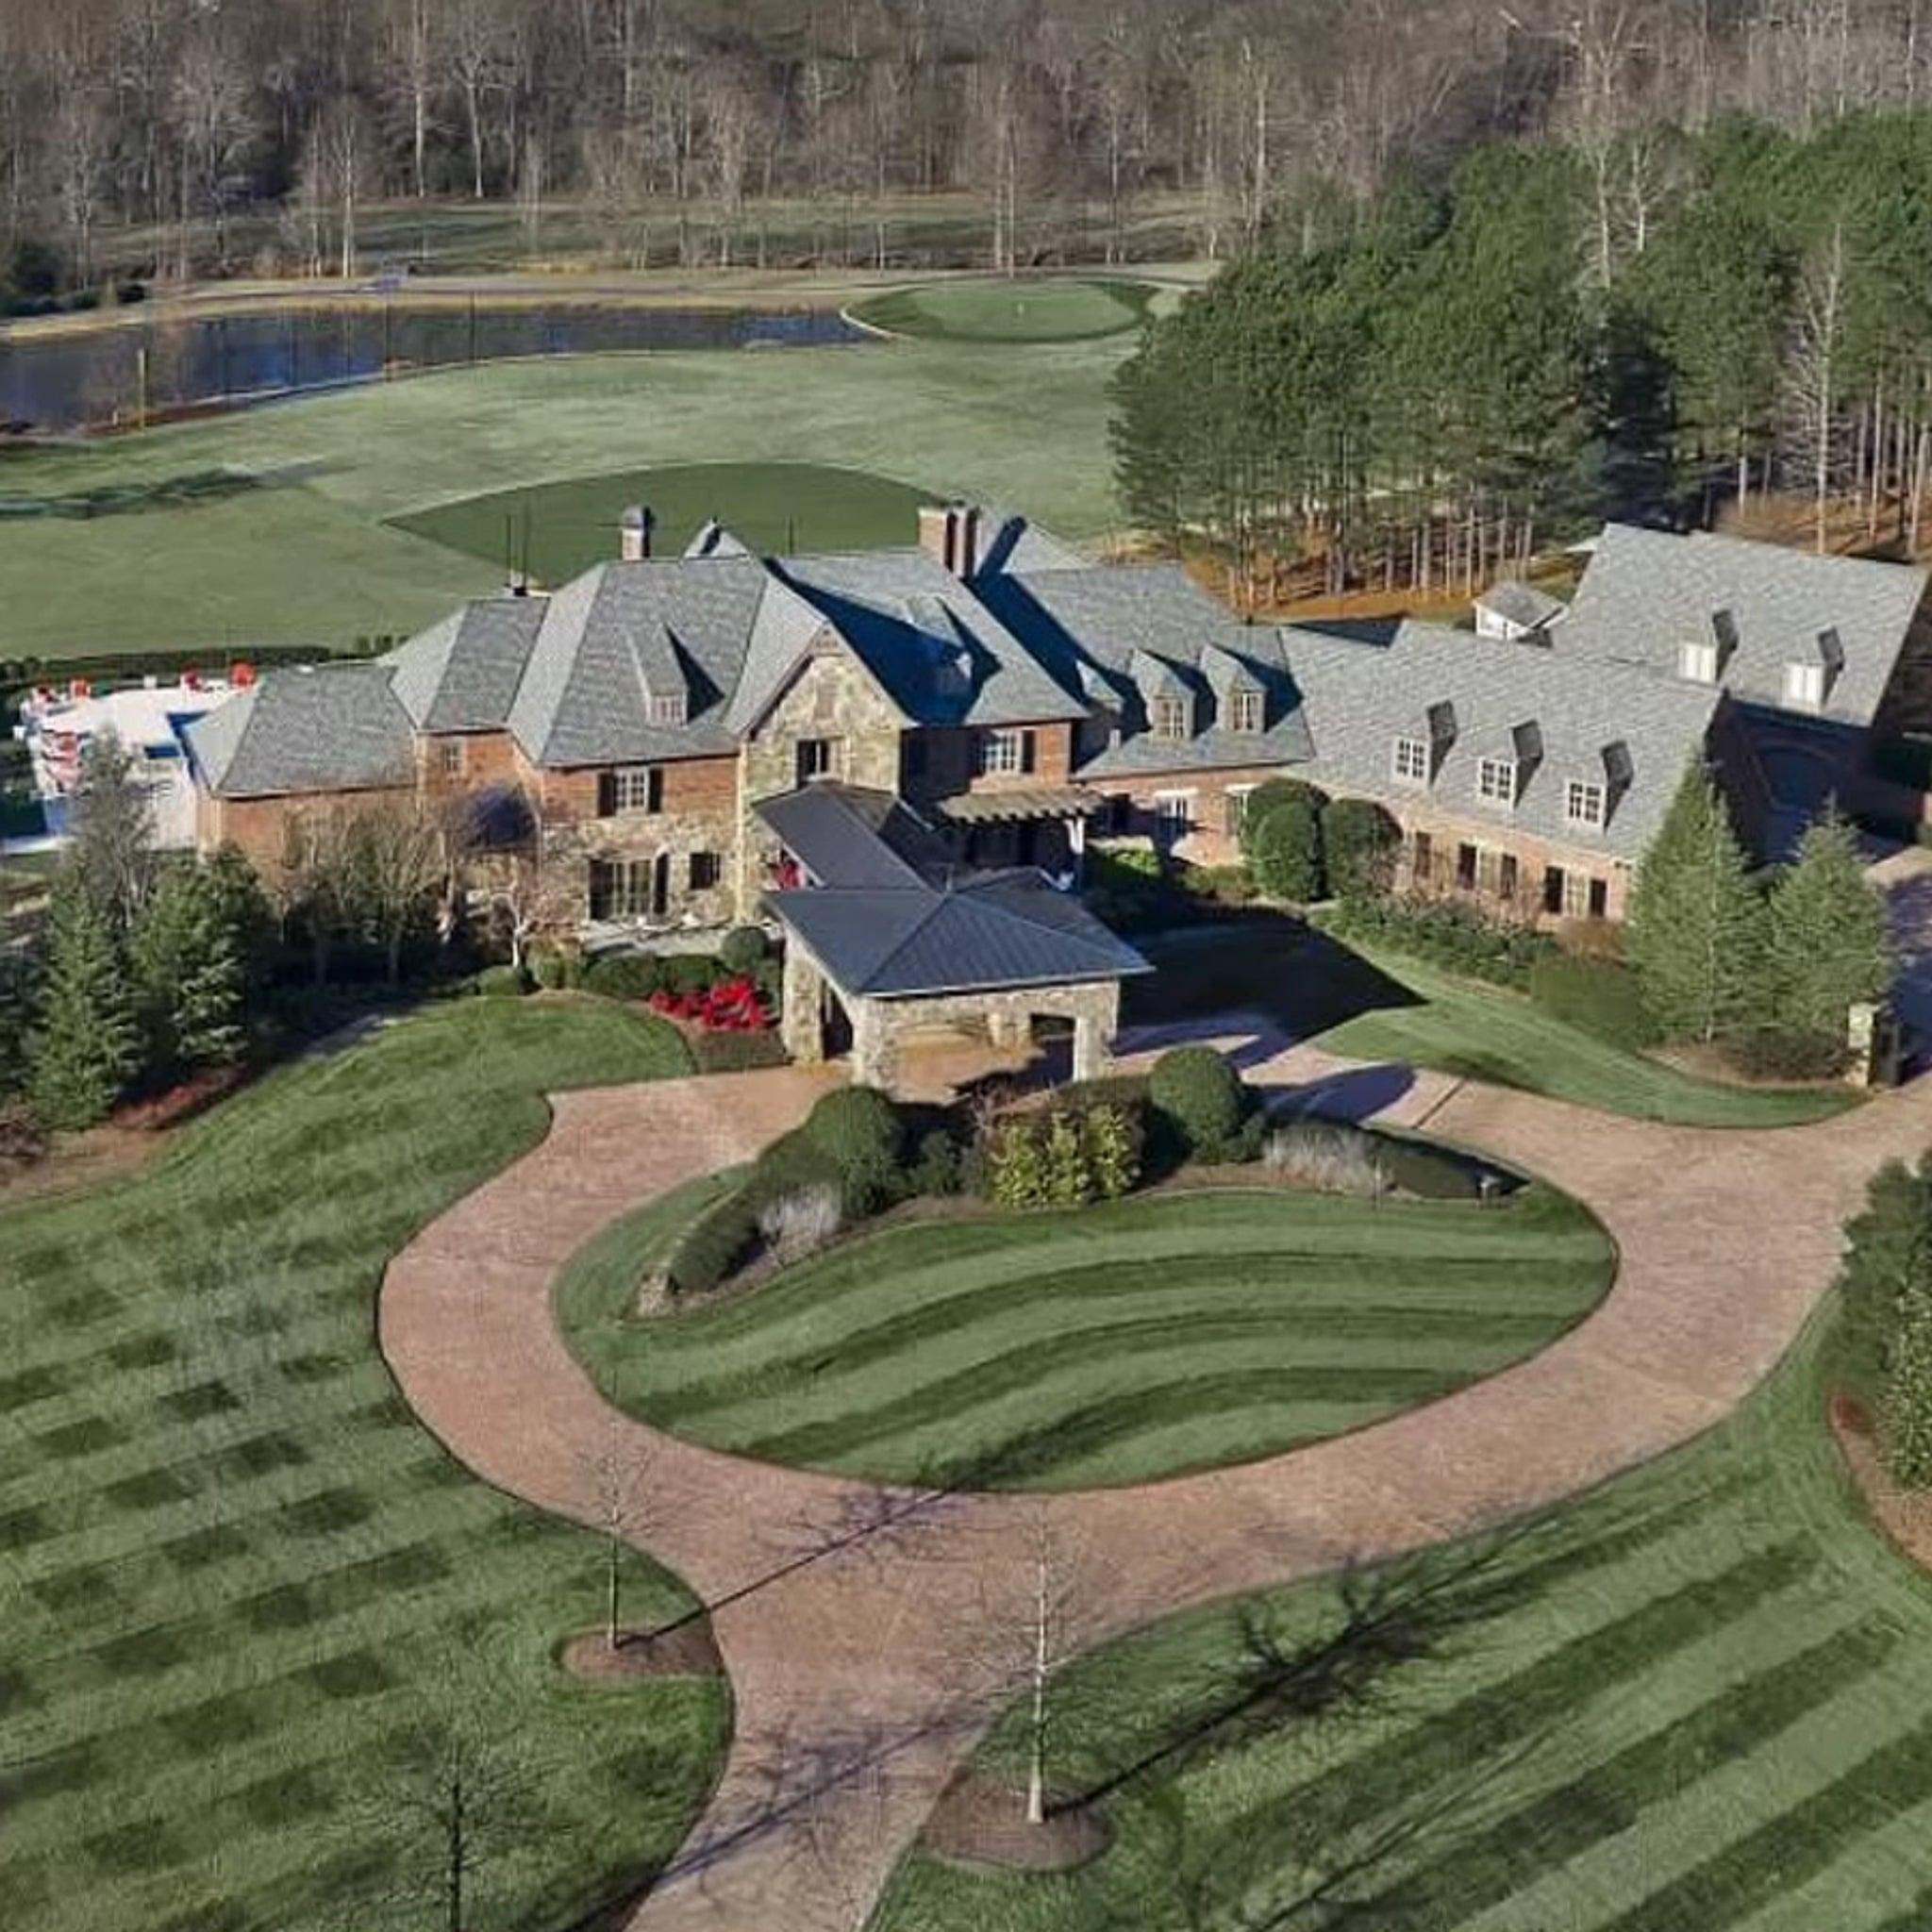 John Smoltz Selling Insane GA Mansion With Baseball Field for $5.2 Million